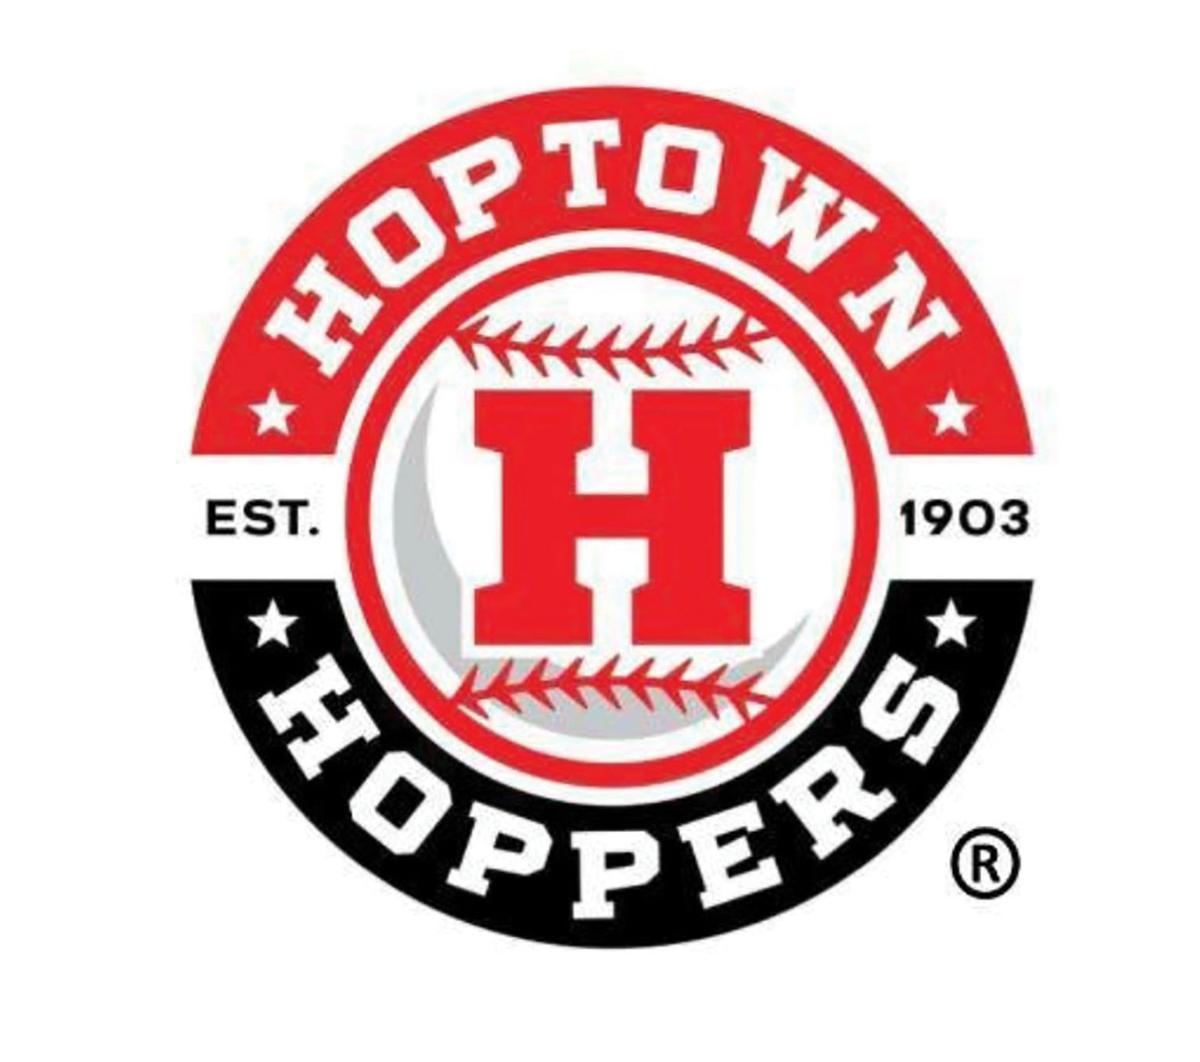 Hoptown